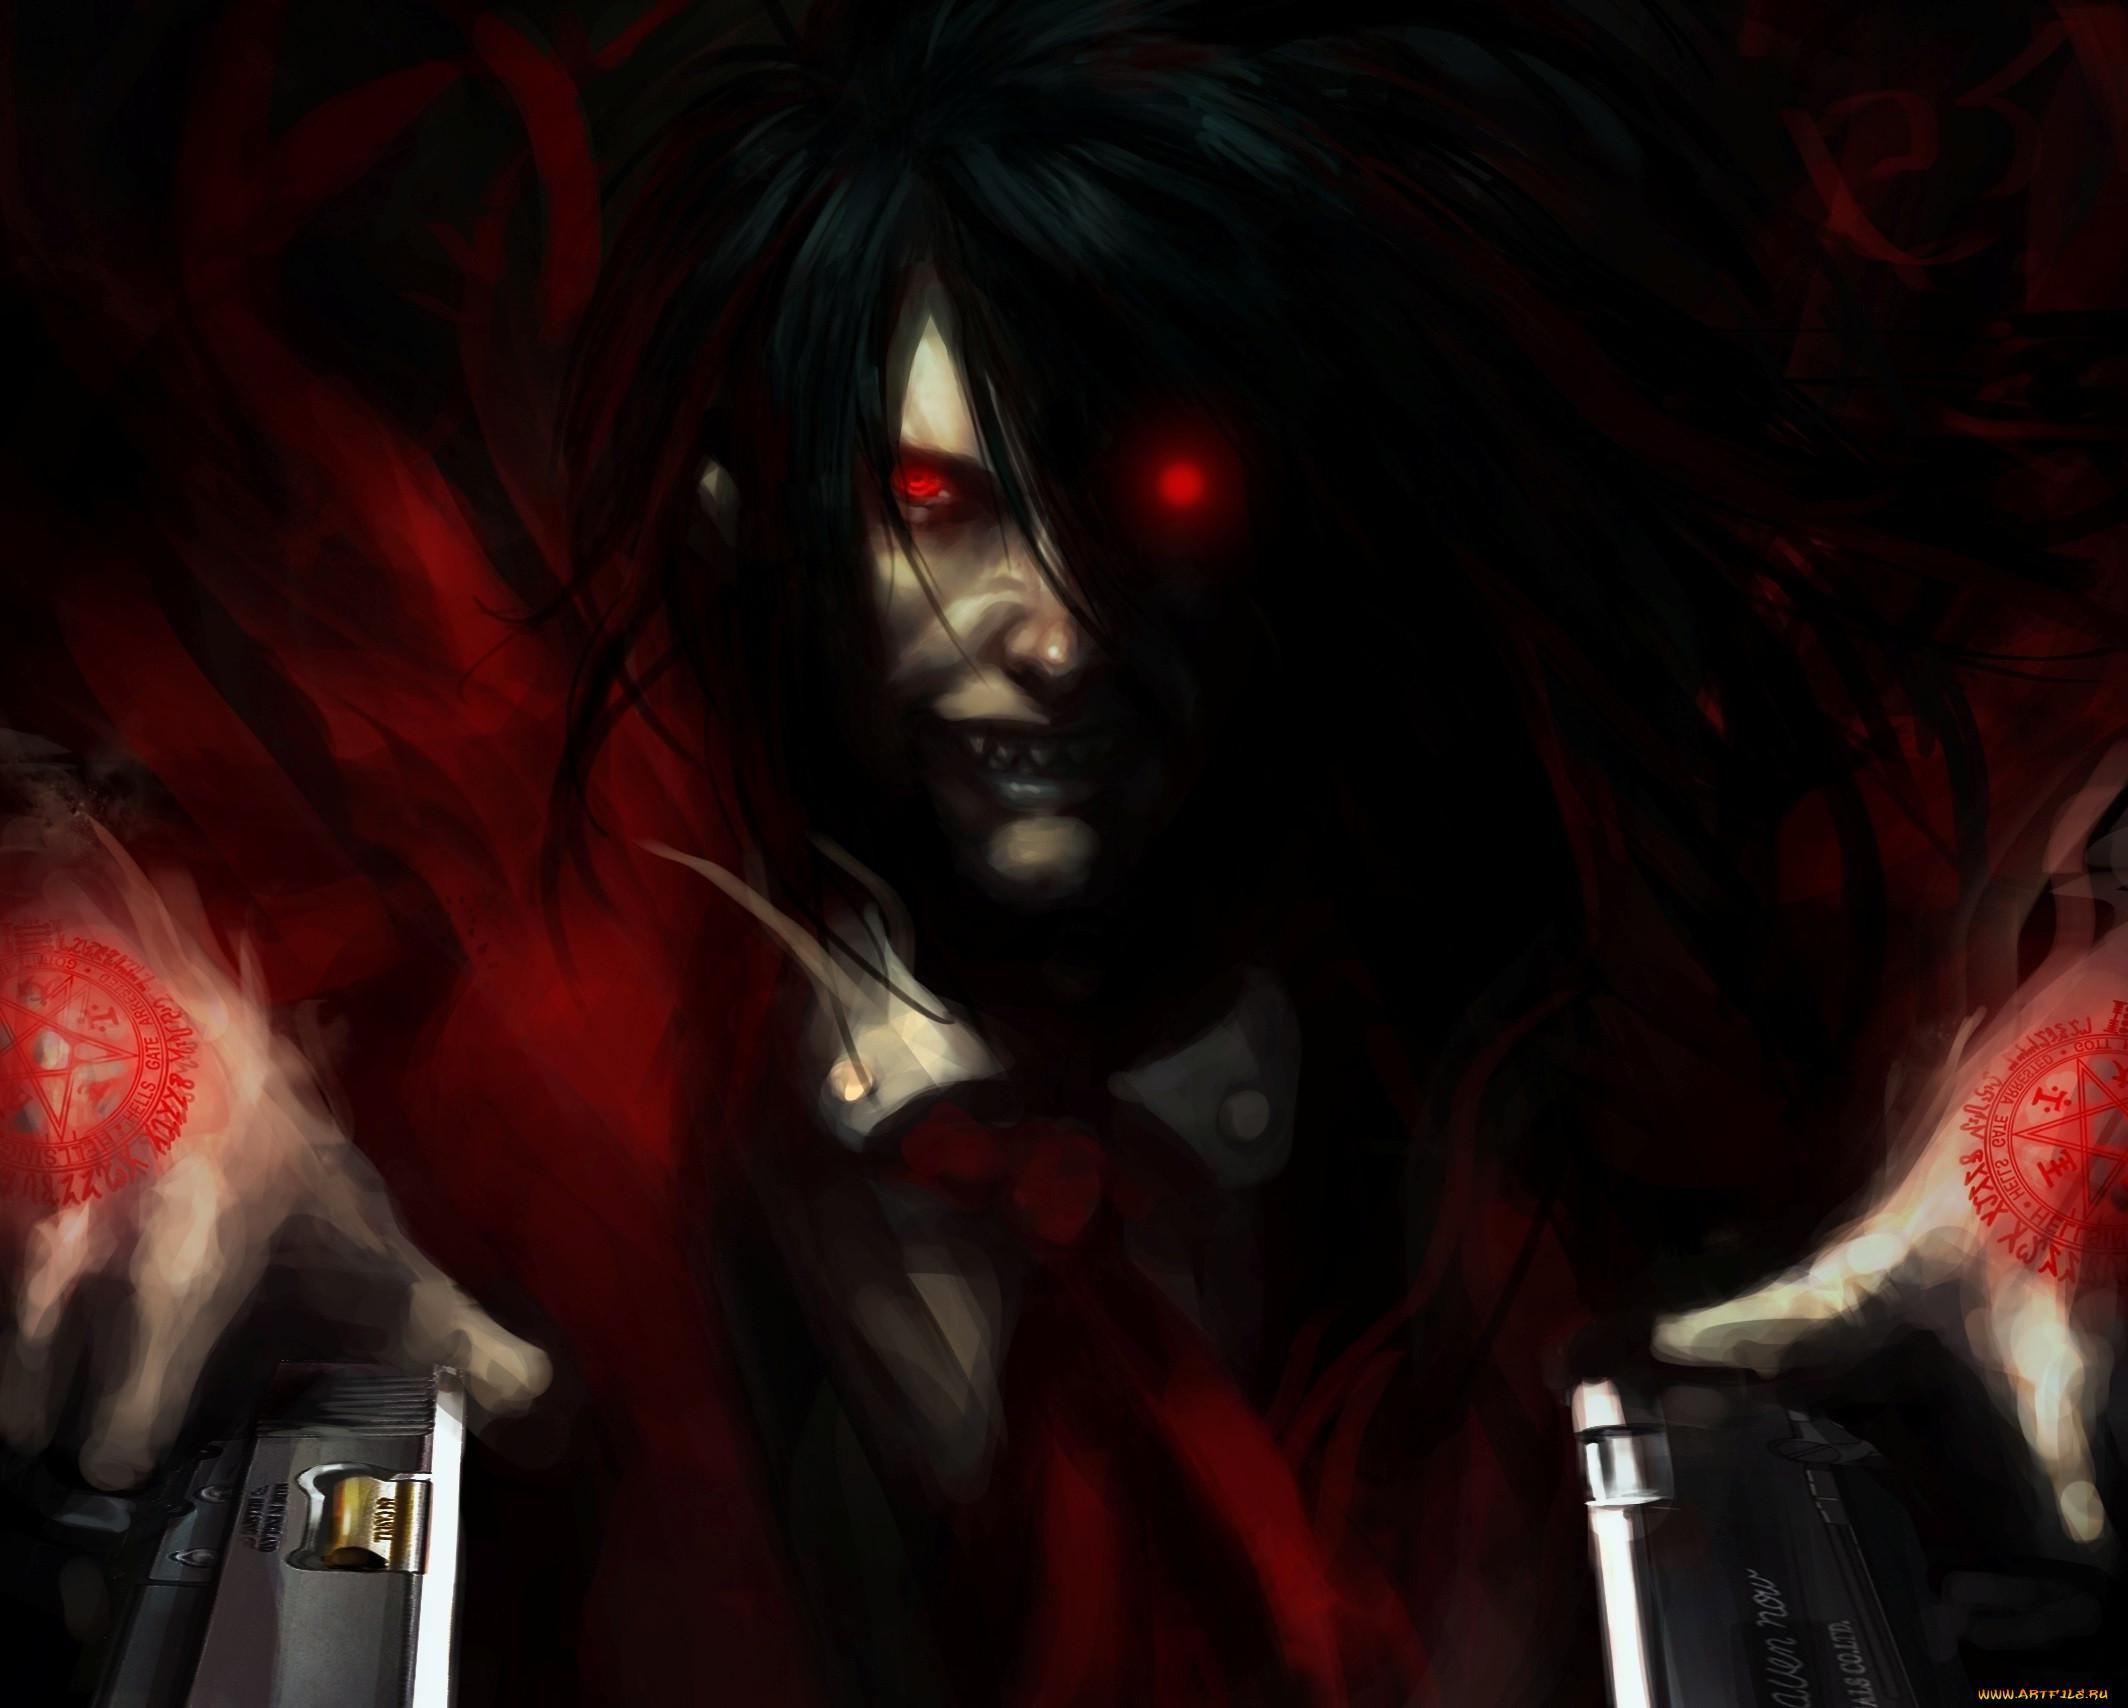 аниме, hellsing, vampire, вампир, парень, арт, leopinheiro, пентаграммы, пистолеты, зубы, alucard, красные, глаза